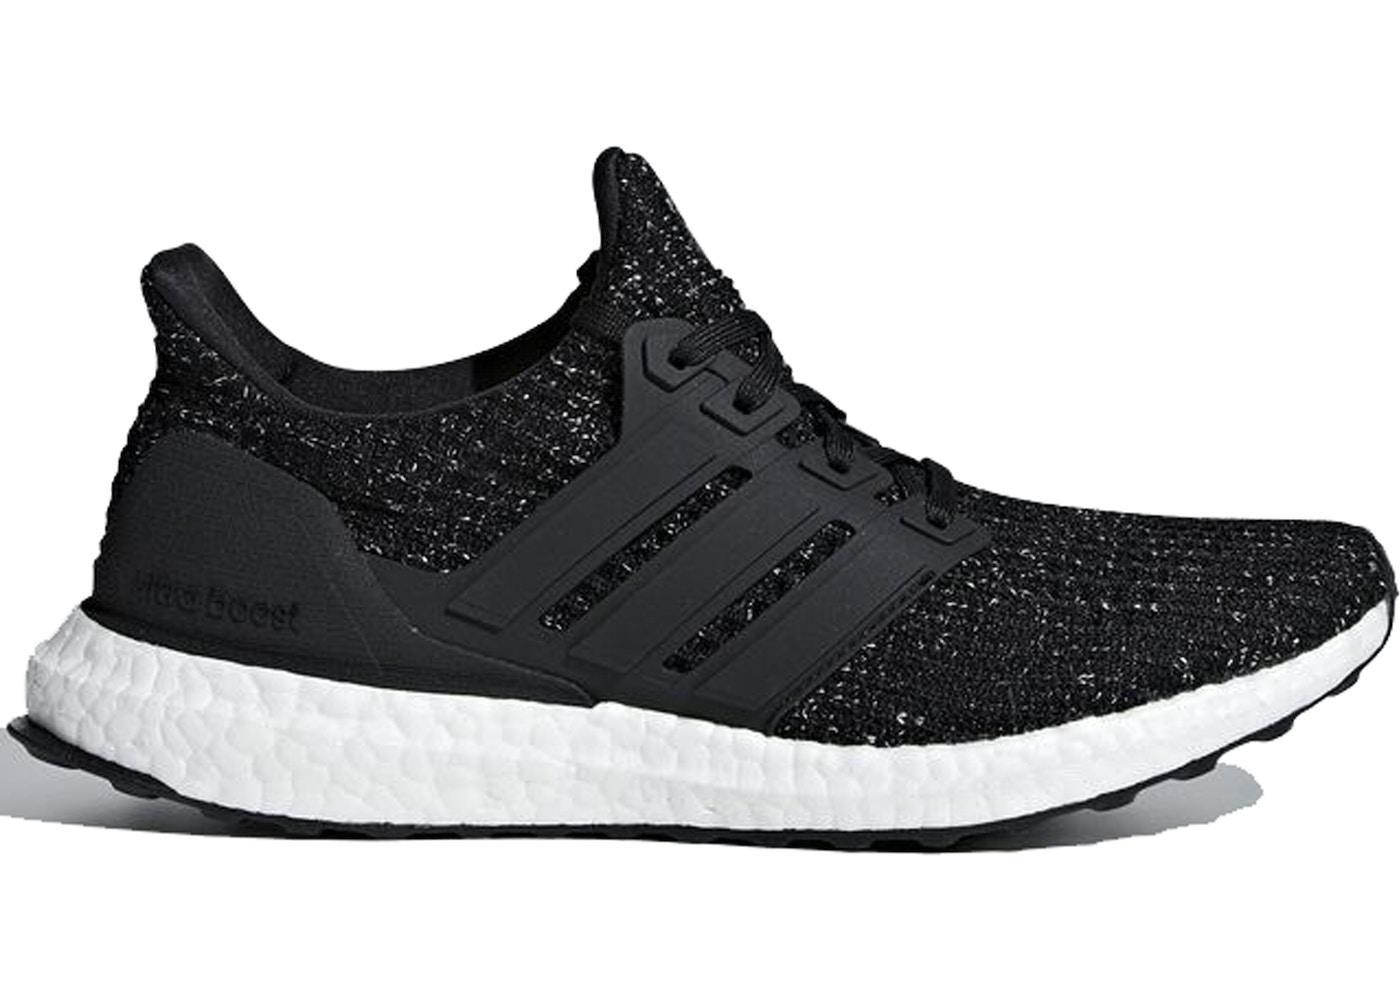 Adidas Ultra Boost 4.0 Core Black Cloud White